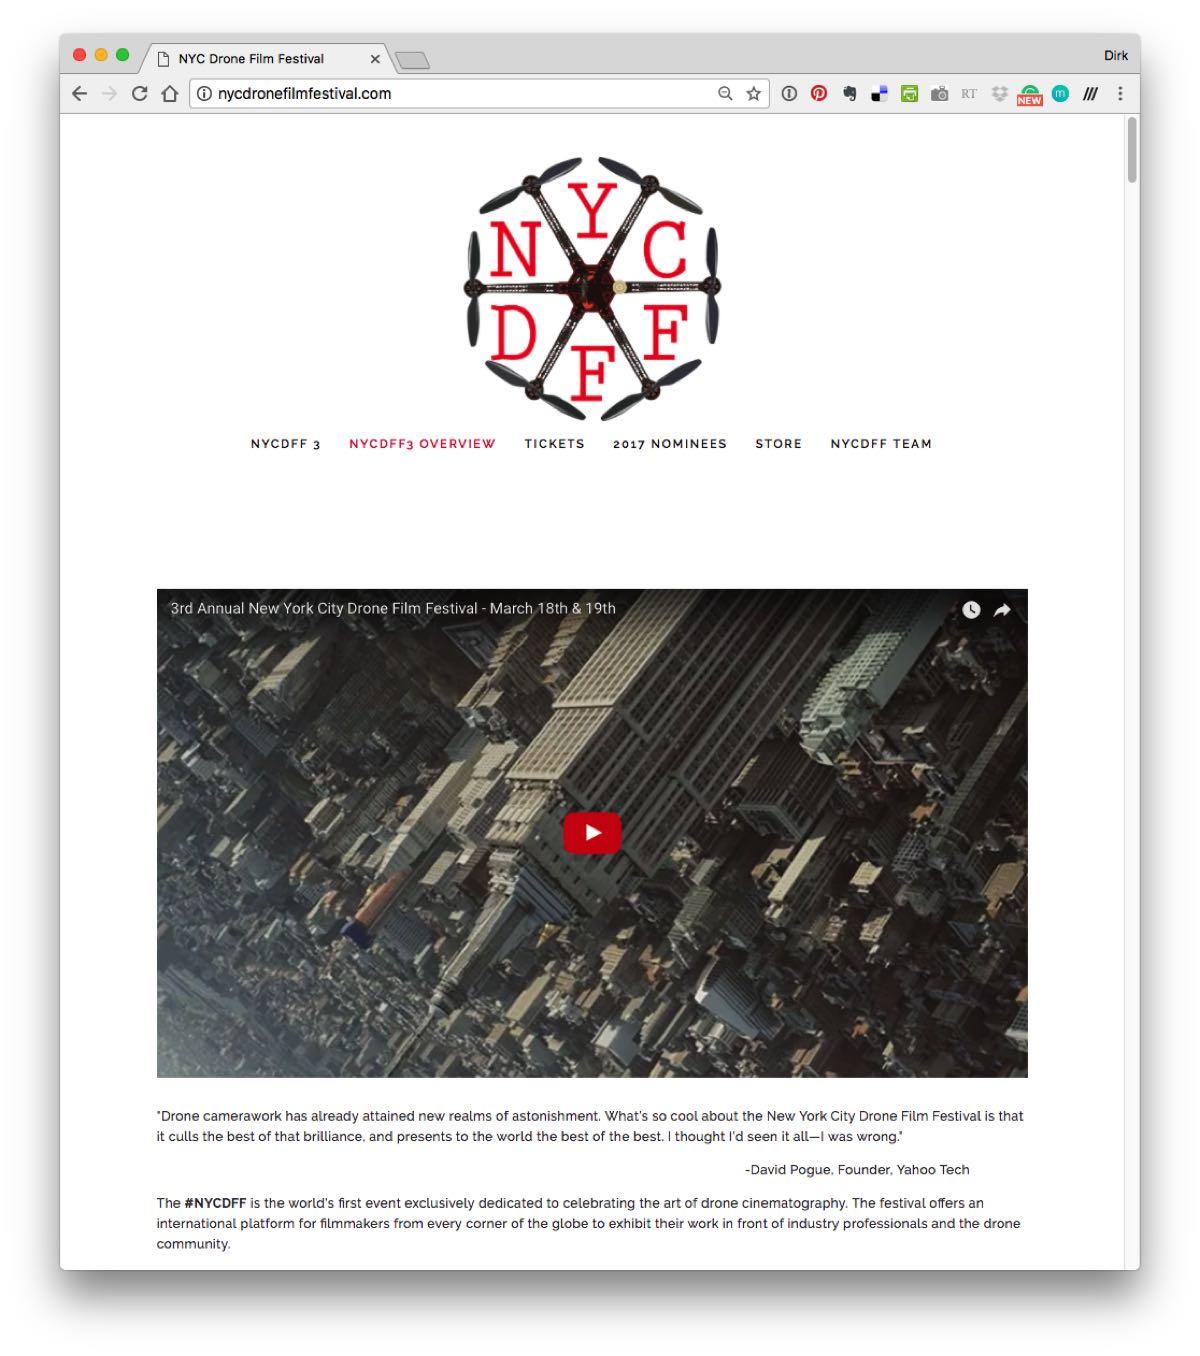 new york city drone film festival nycdff